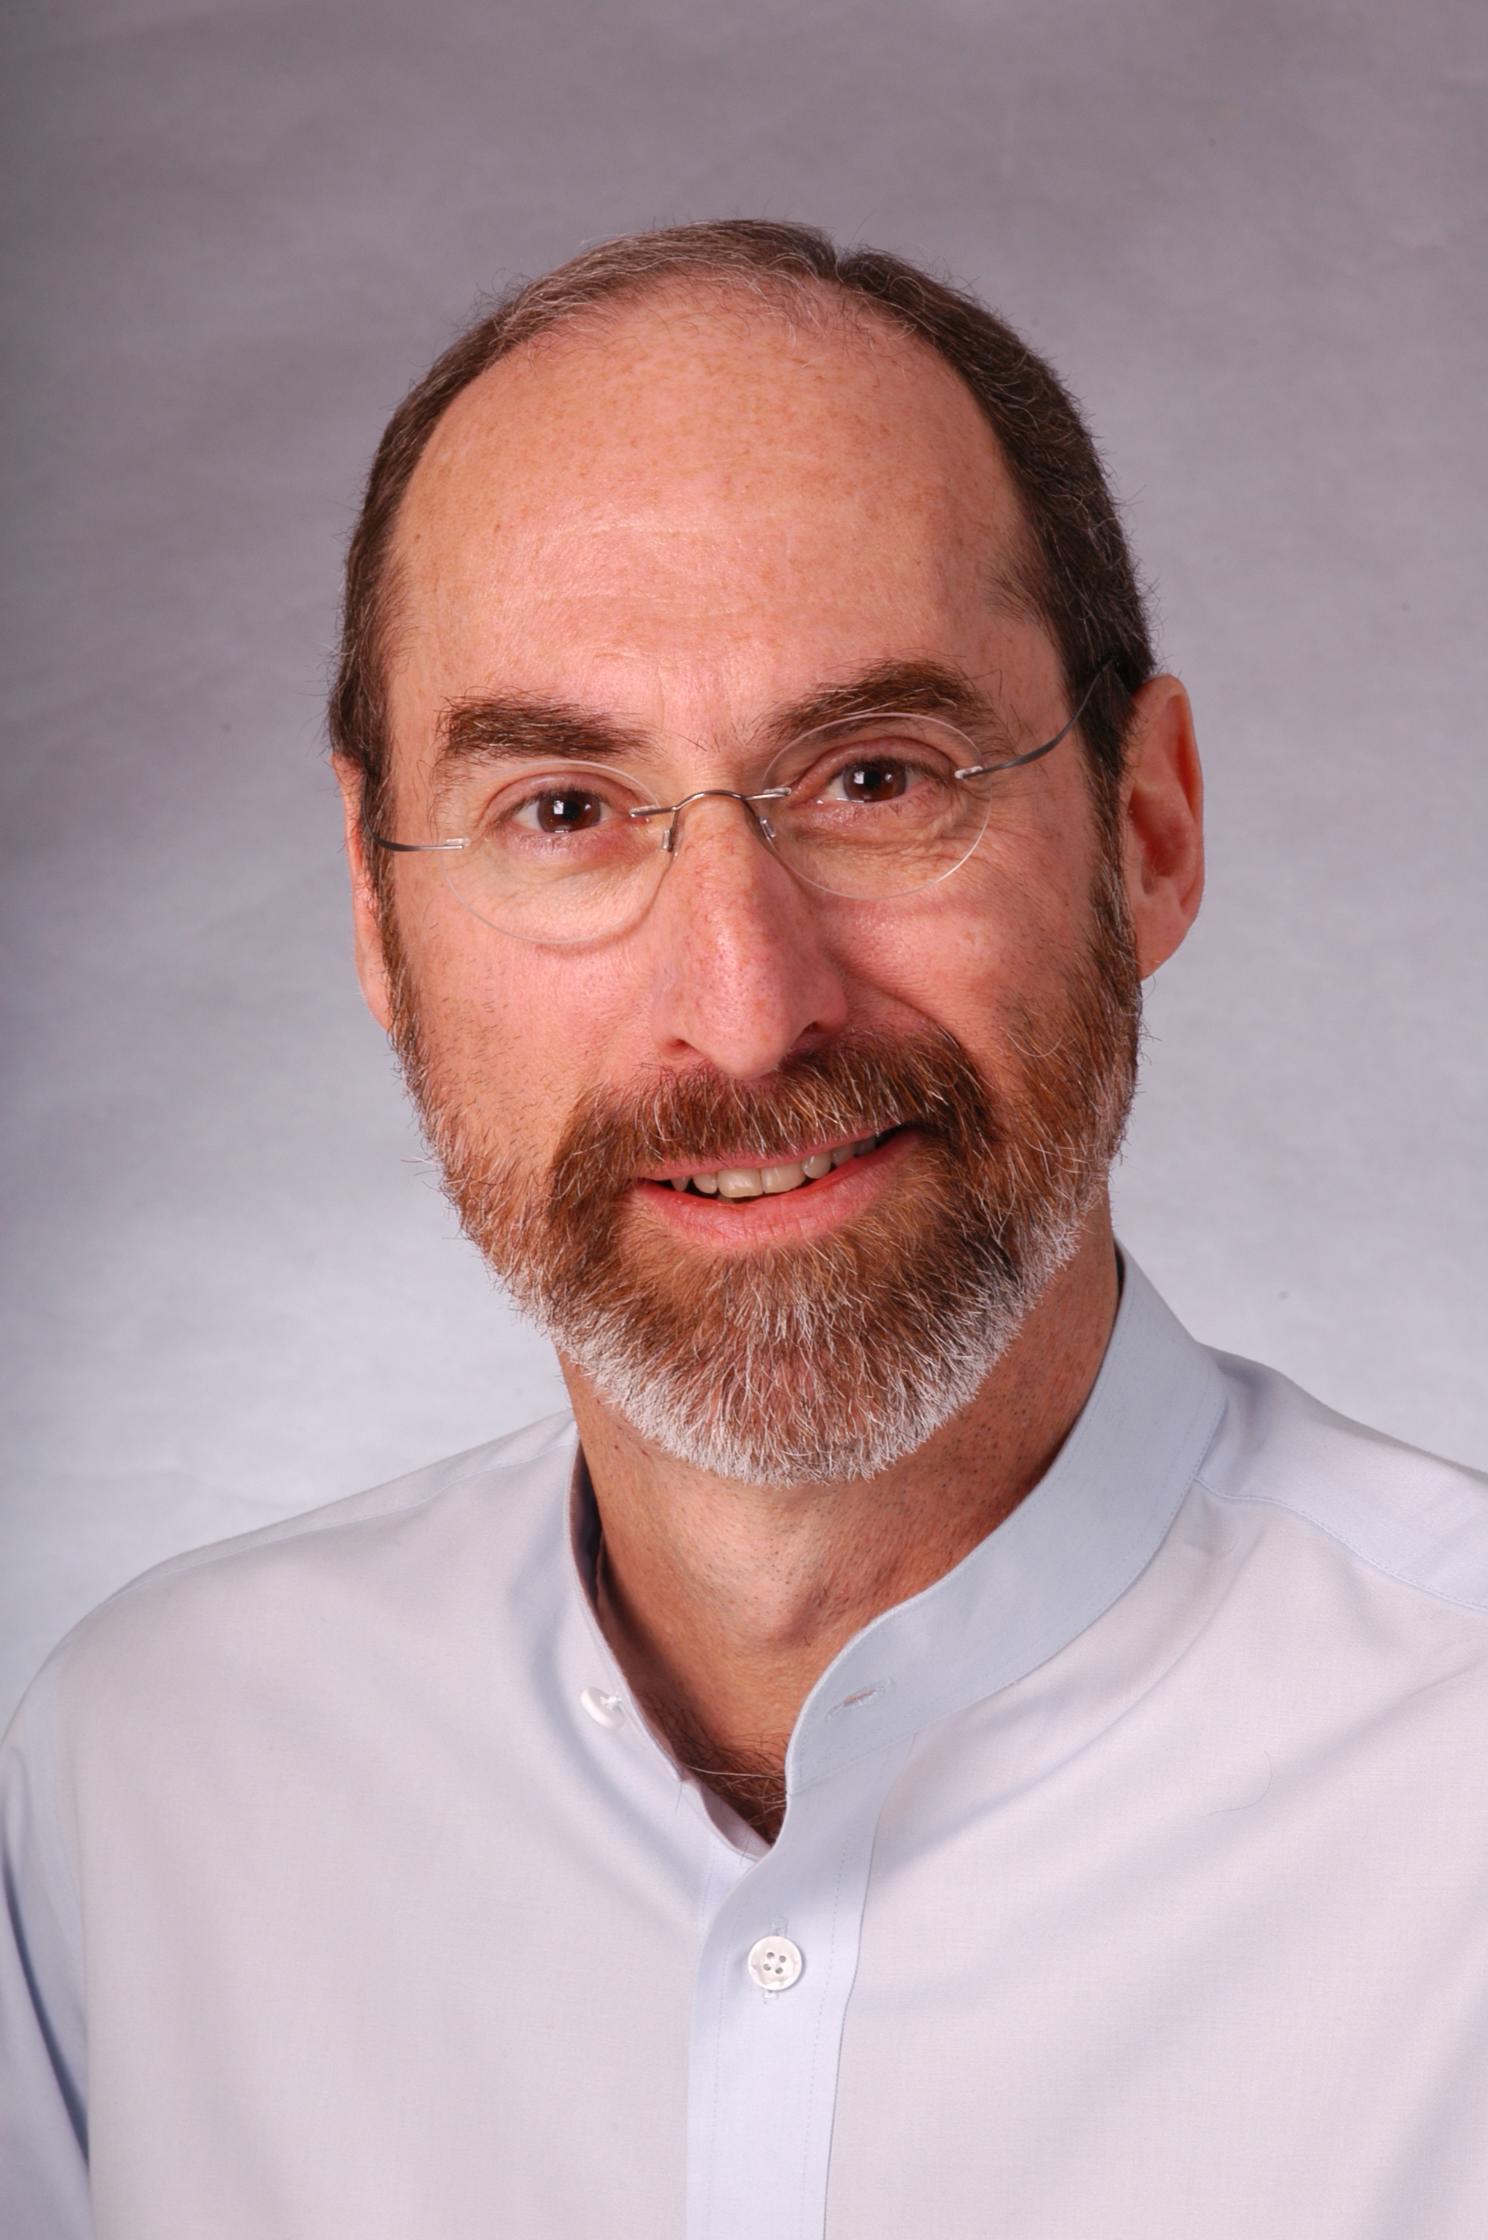 Barry Egener